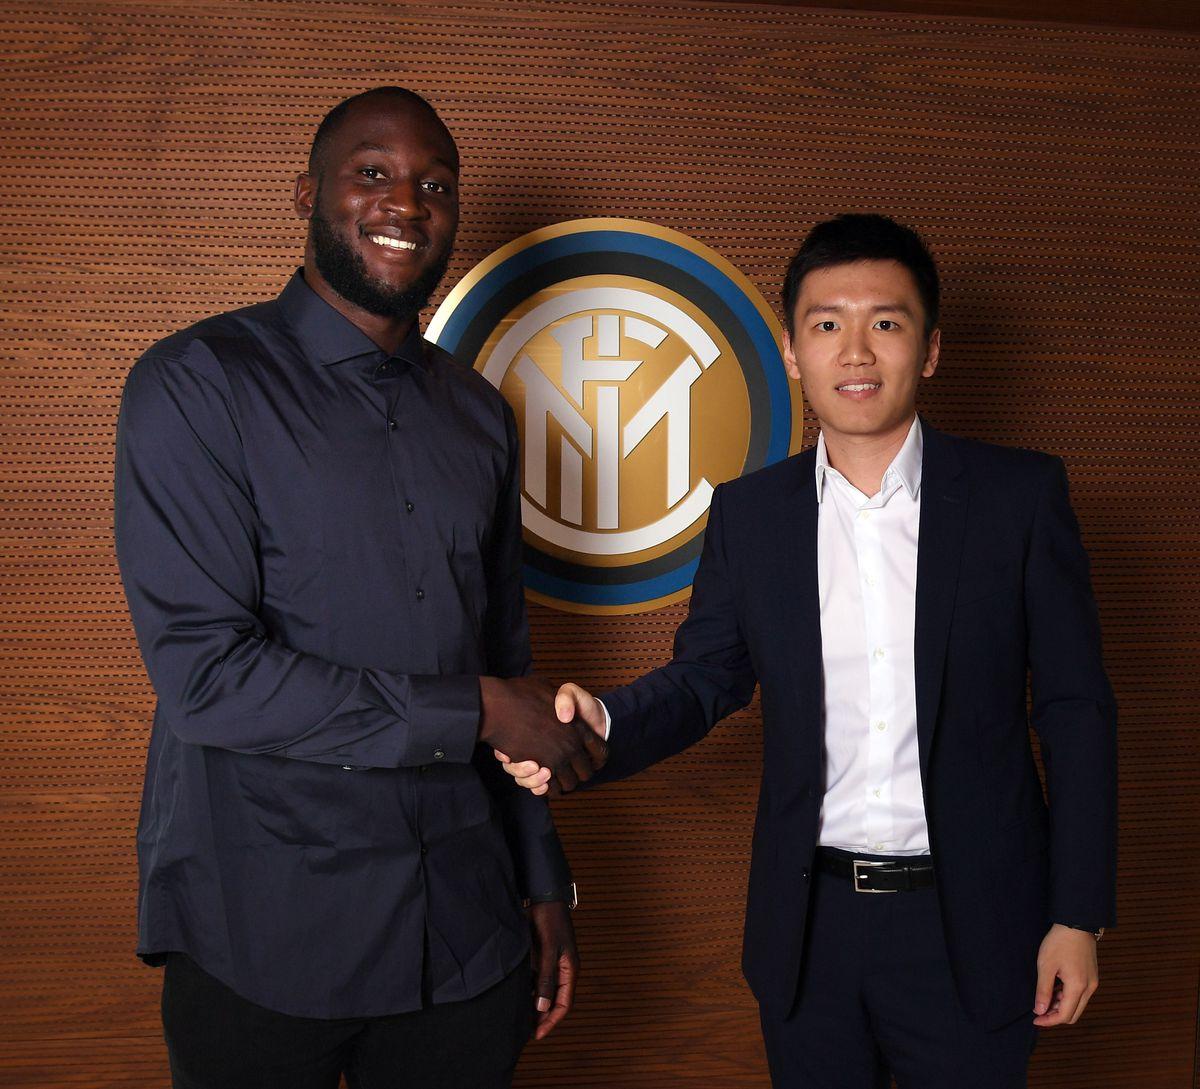 FC Internazionale Unveils New Signing Romelu Lukaku